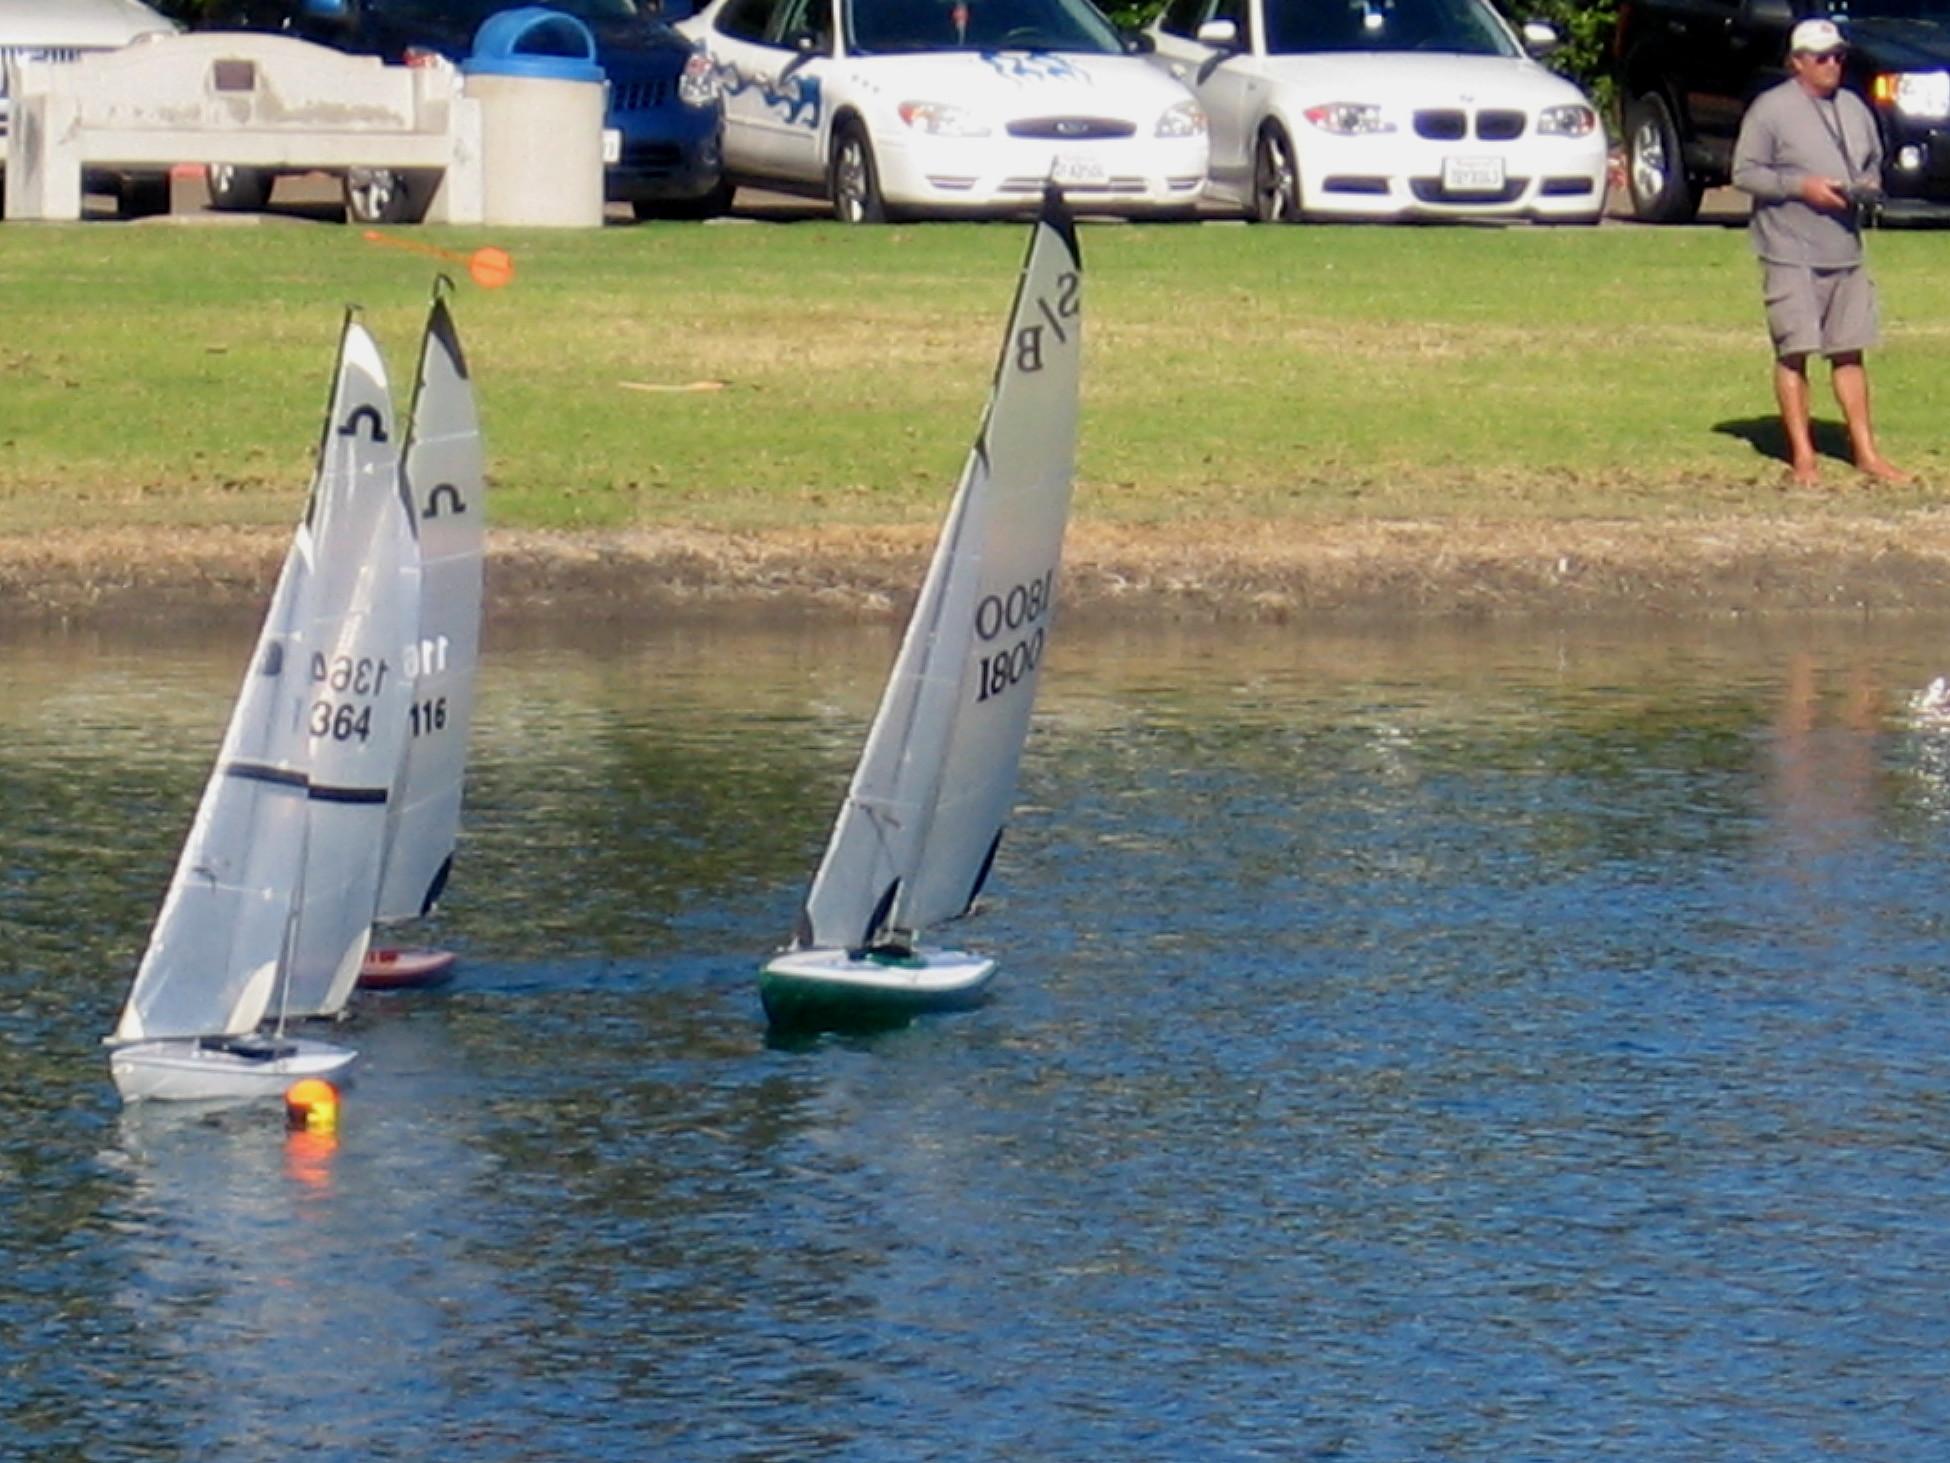 Fun sailing on Mission Bay's model boat pond  – Cool San